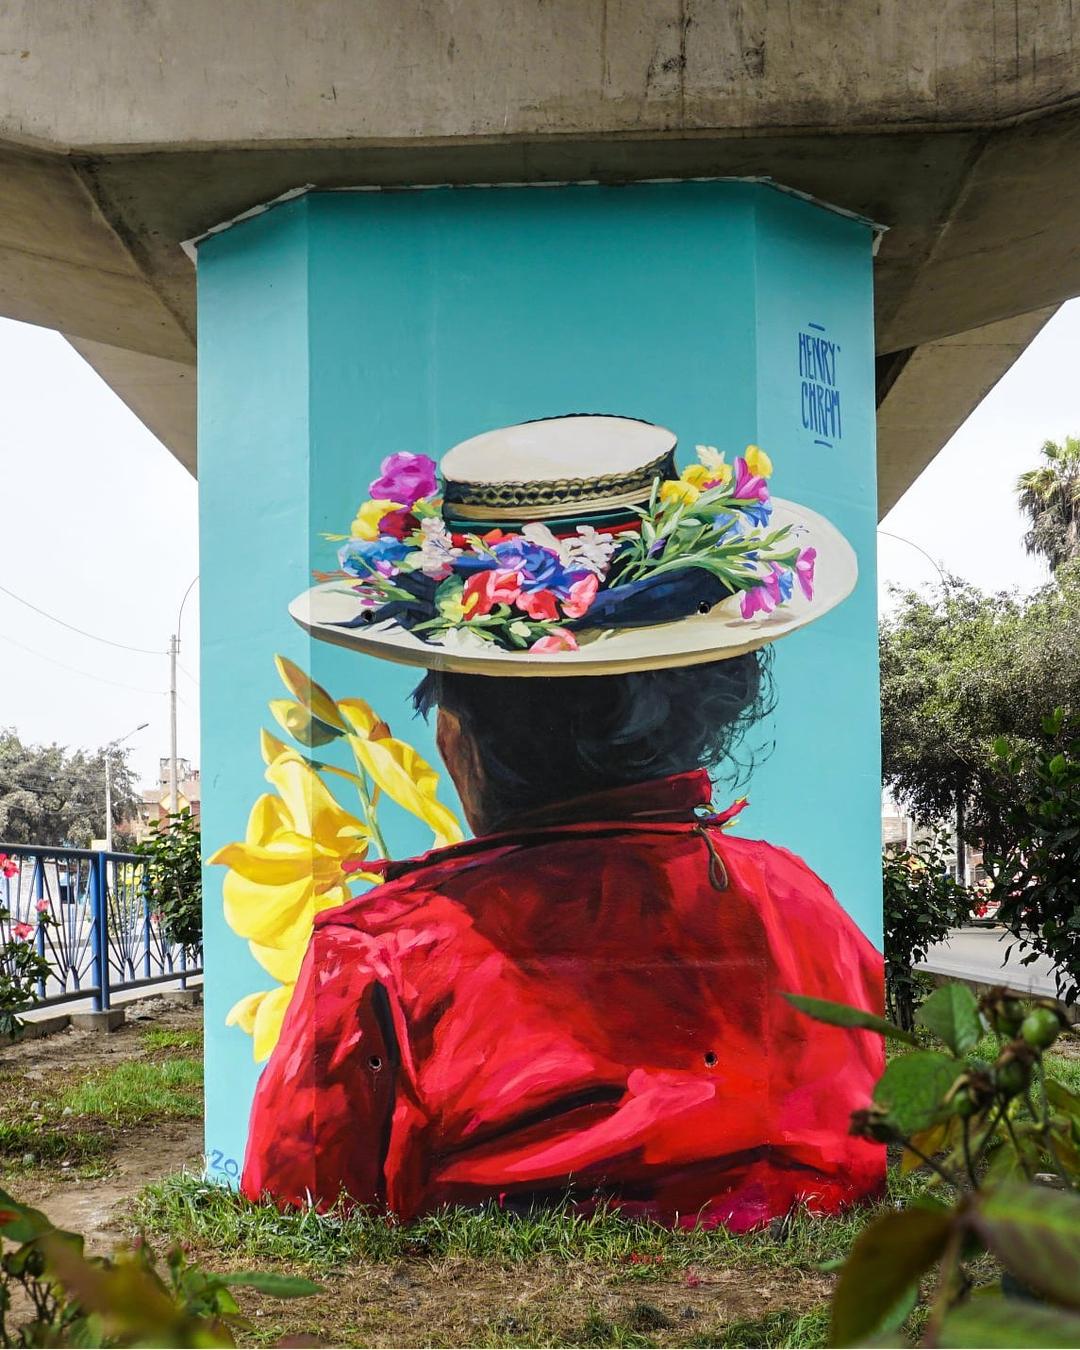 Henry Chram @ Lima, Peru